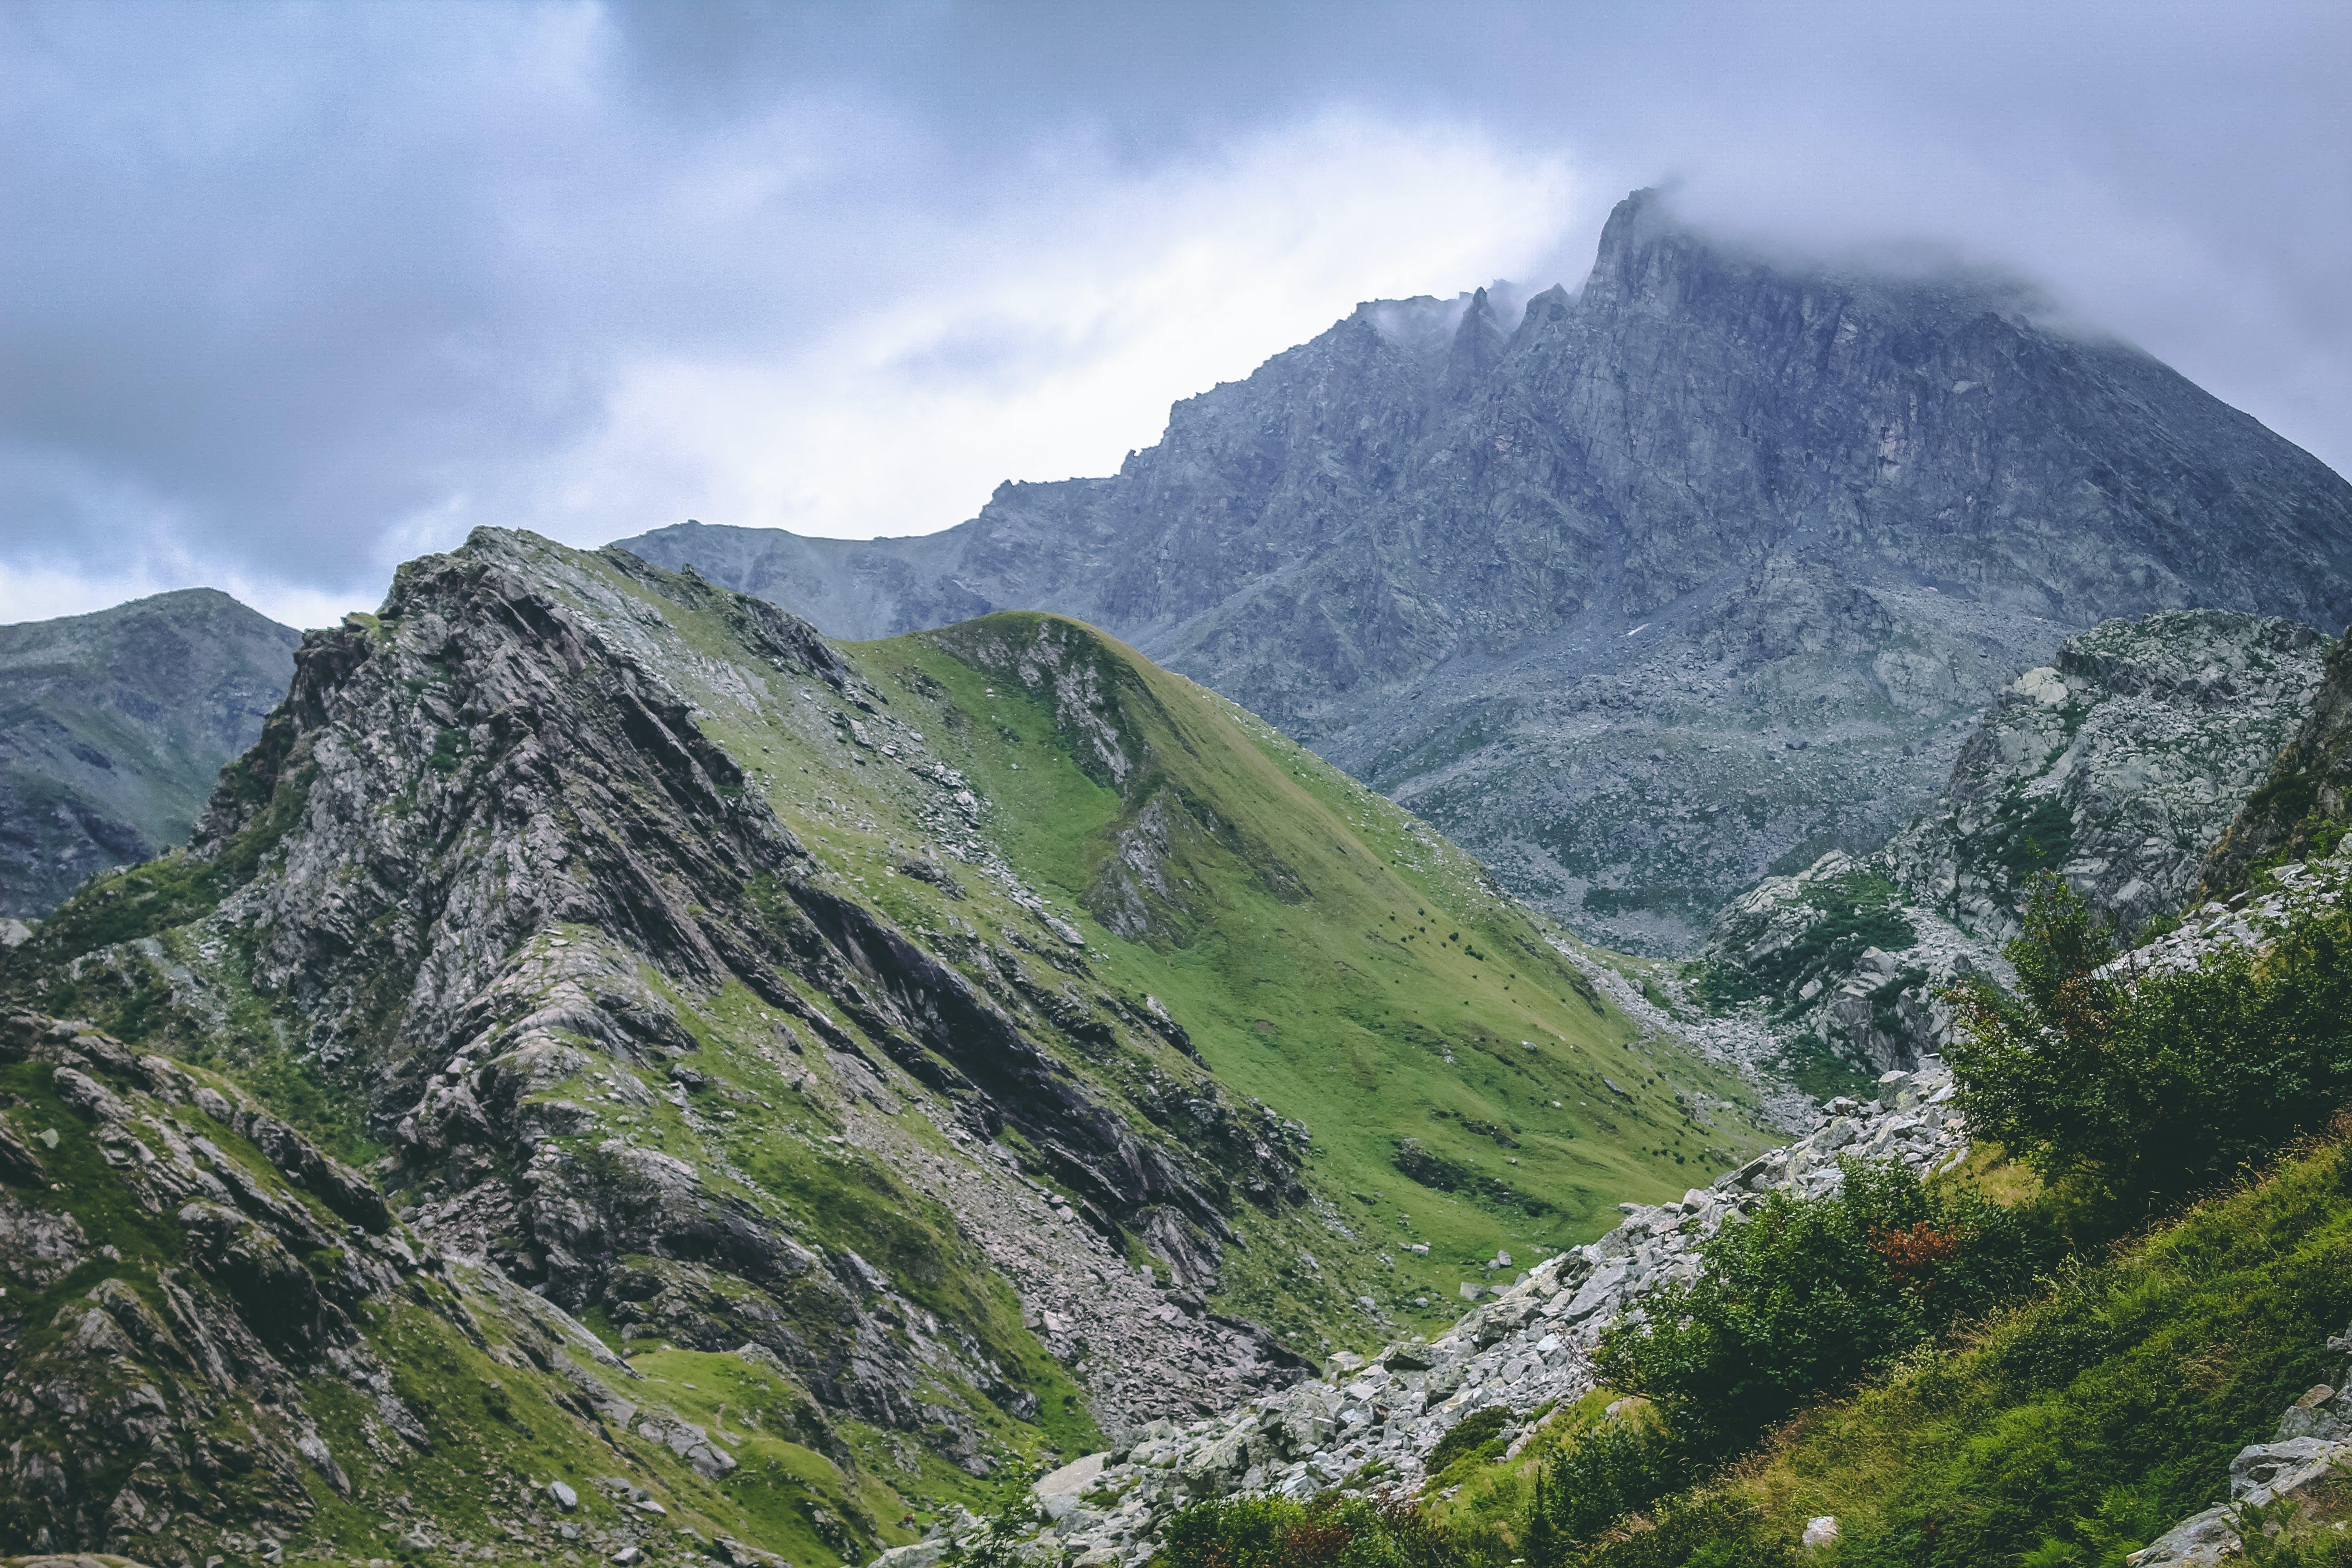 Green Grass Mountain Taken